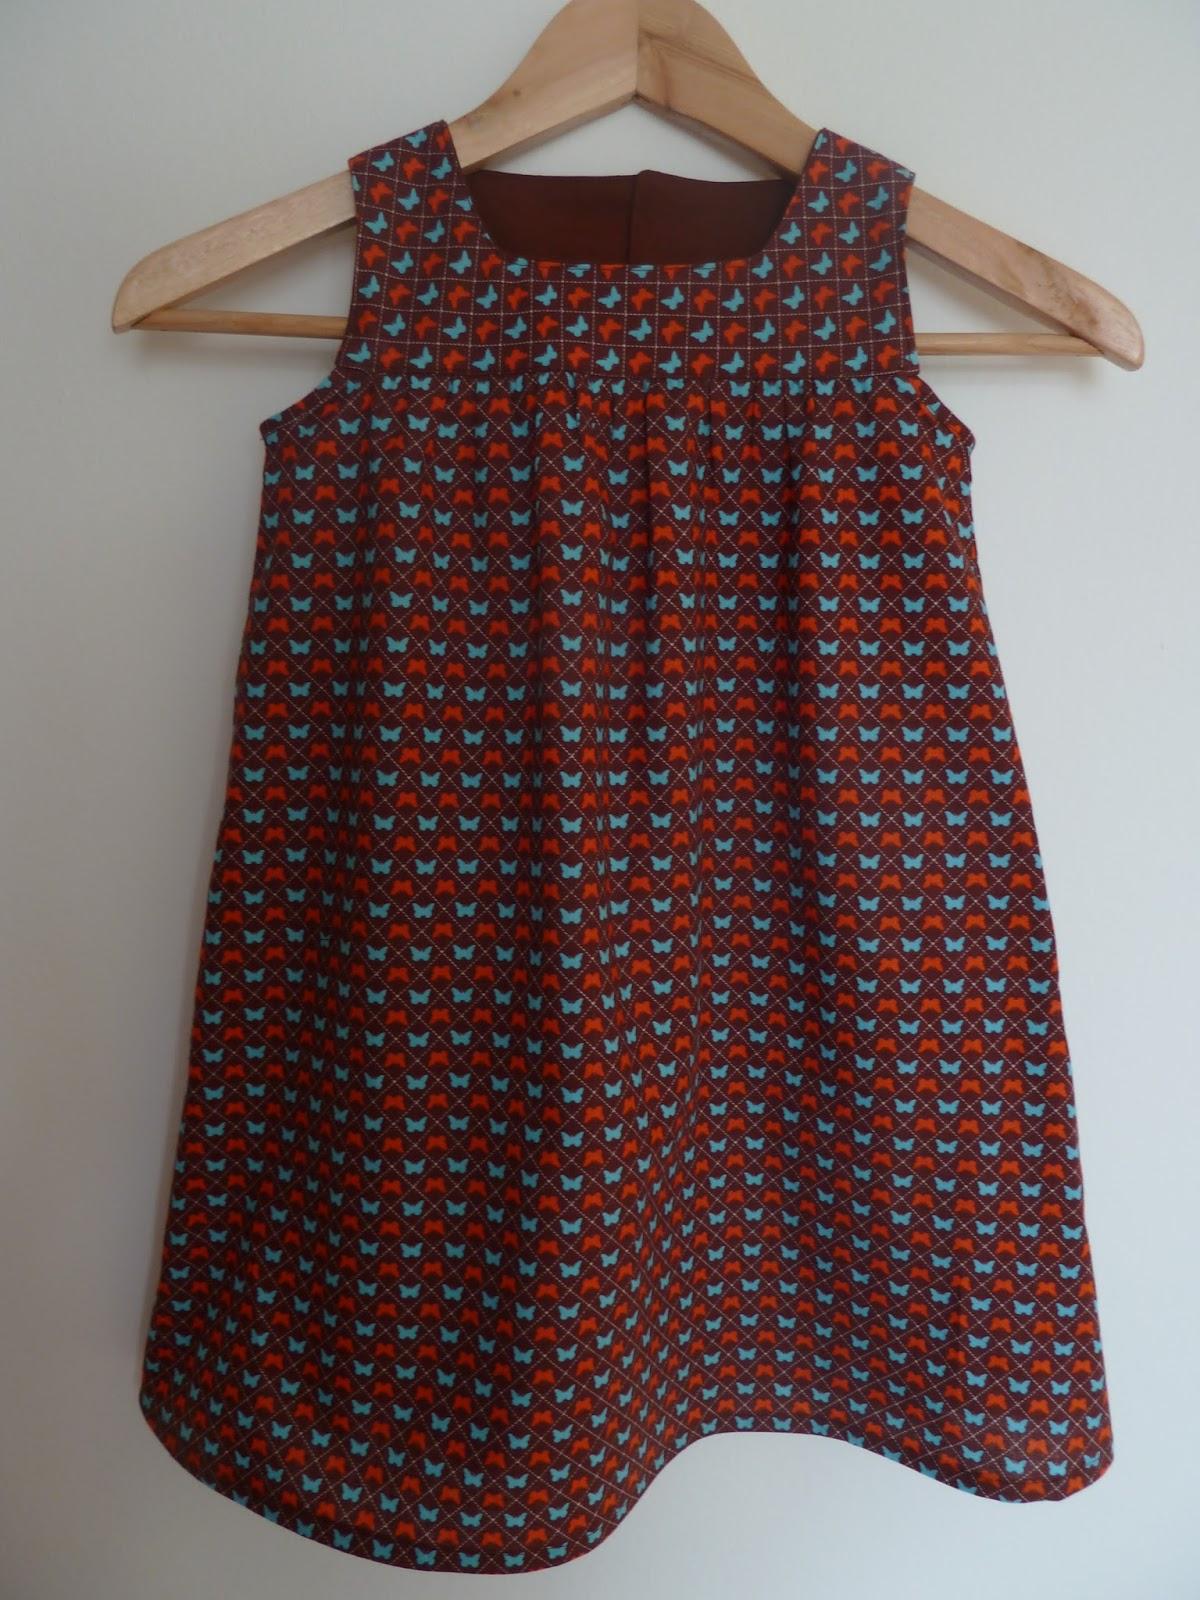 zauberflink: Japanisch nähen / japanese sewing